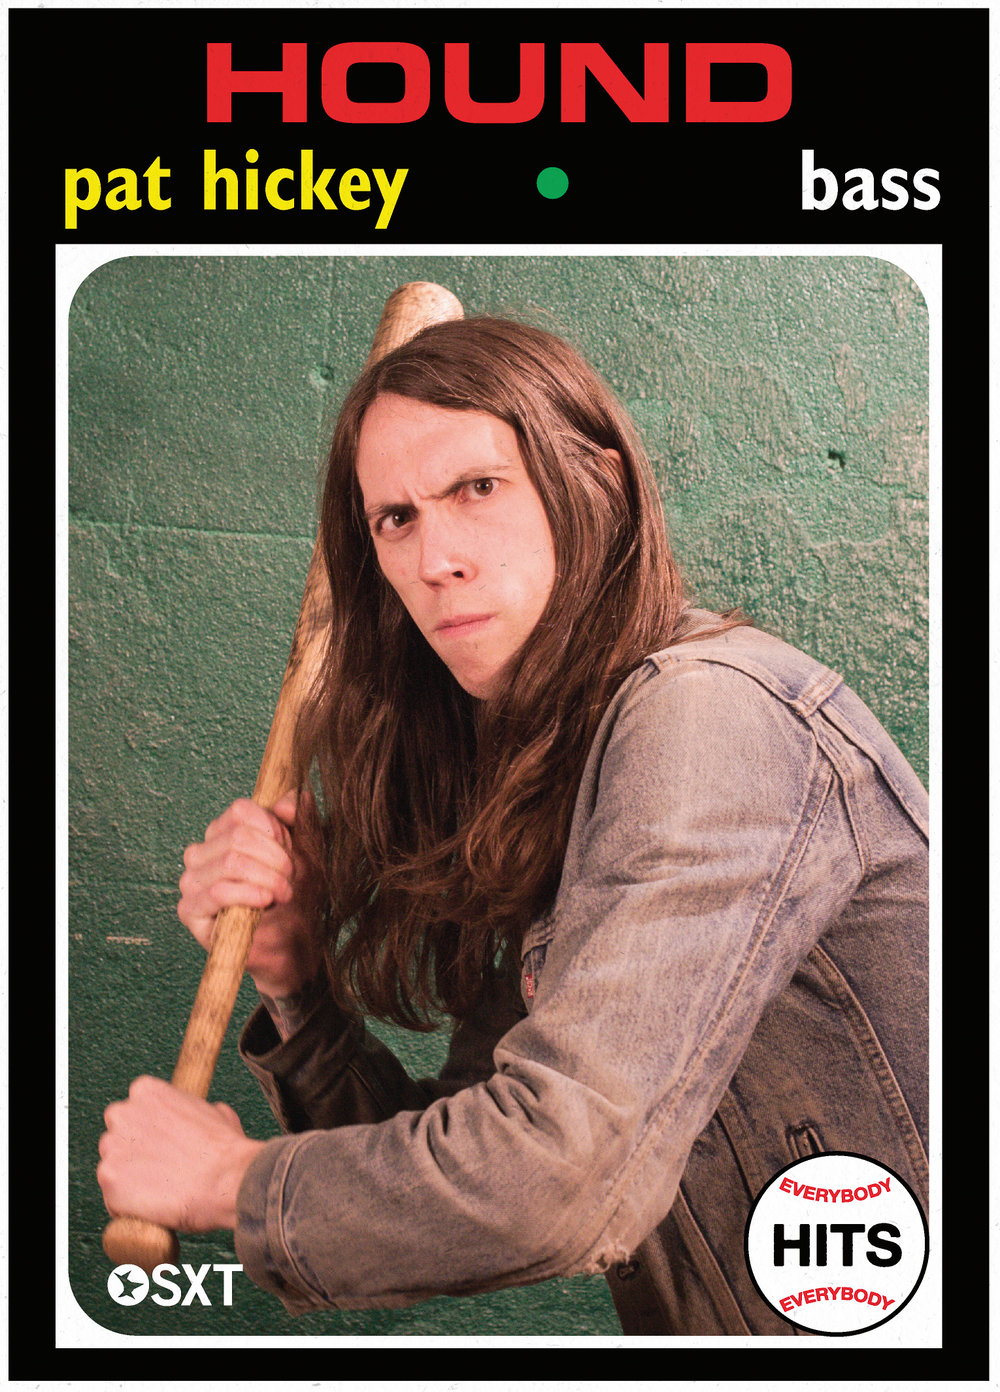 Pat Hickey of Hound